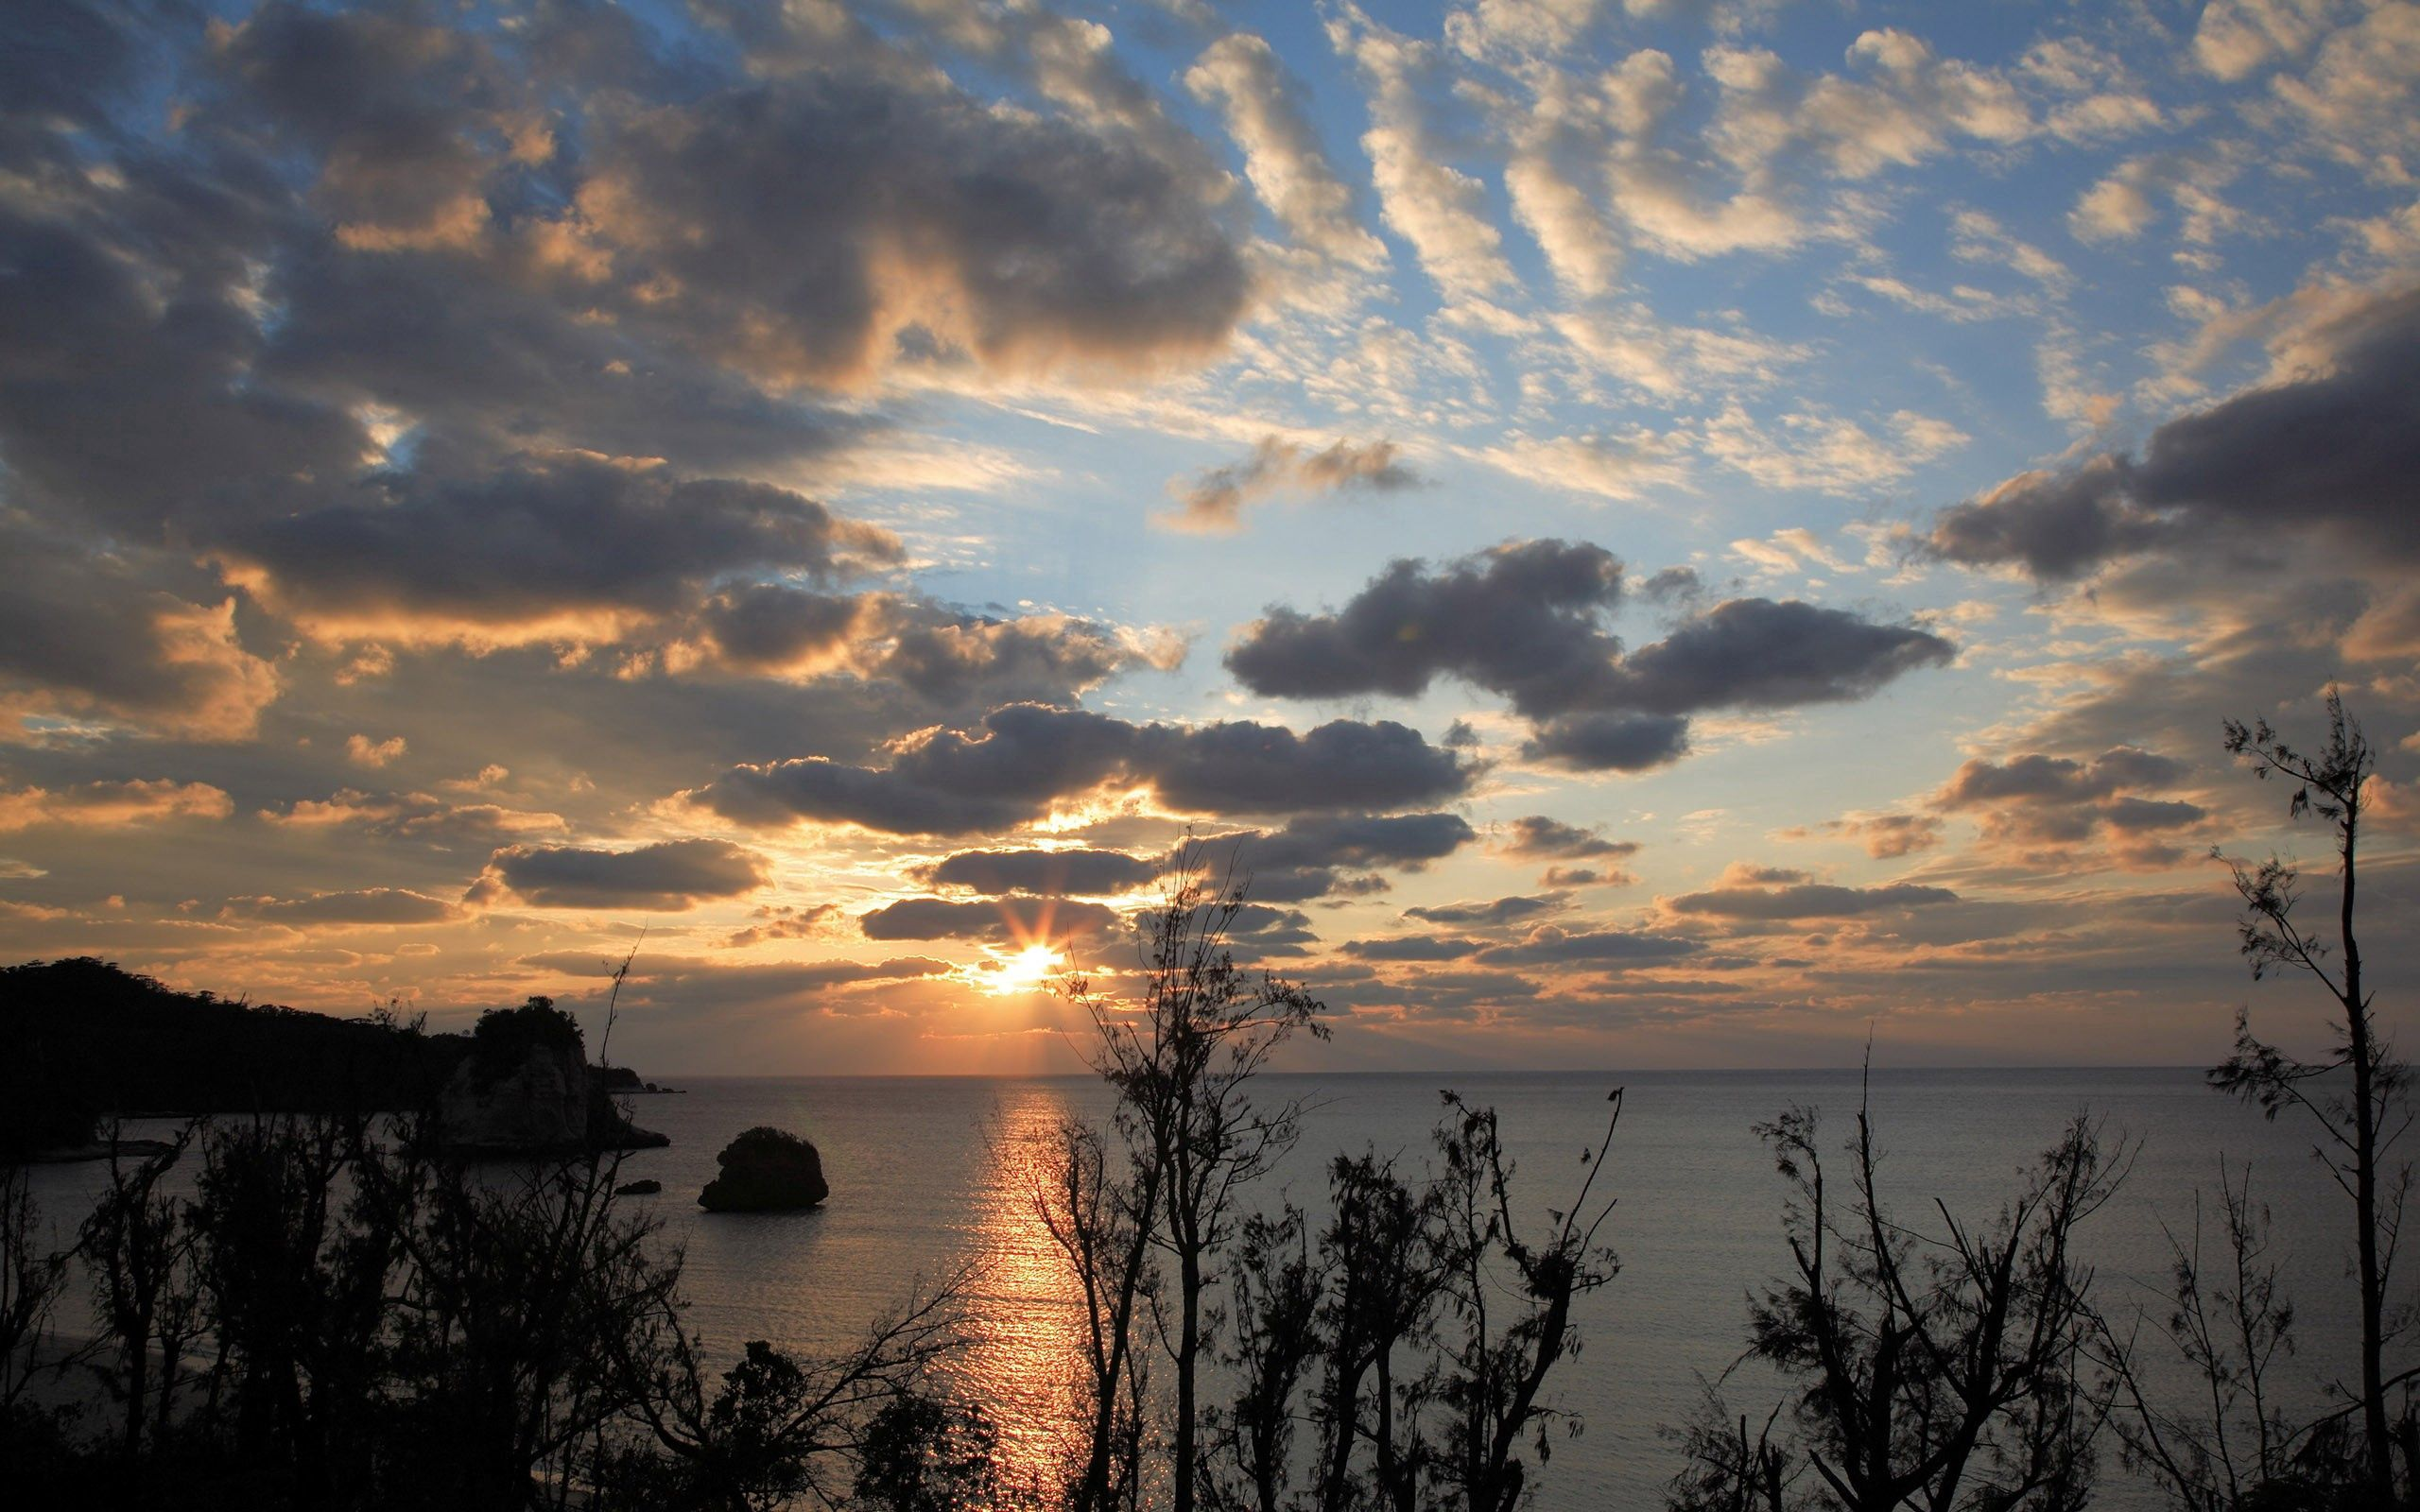 149097 скачать обои Природа, Река, Небо, Фон, Свет, Лето - заставки и картинки бесплатно